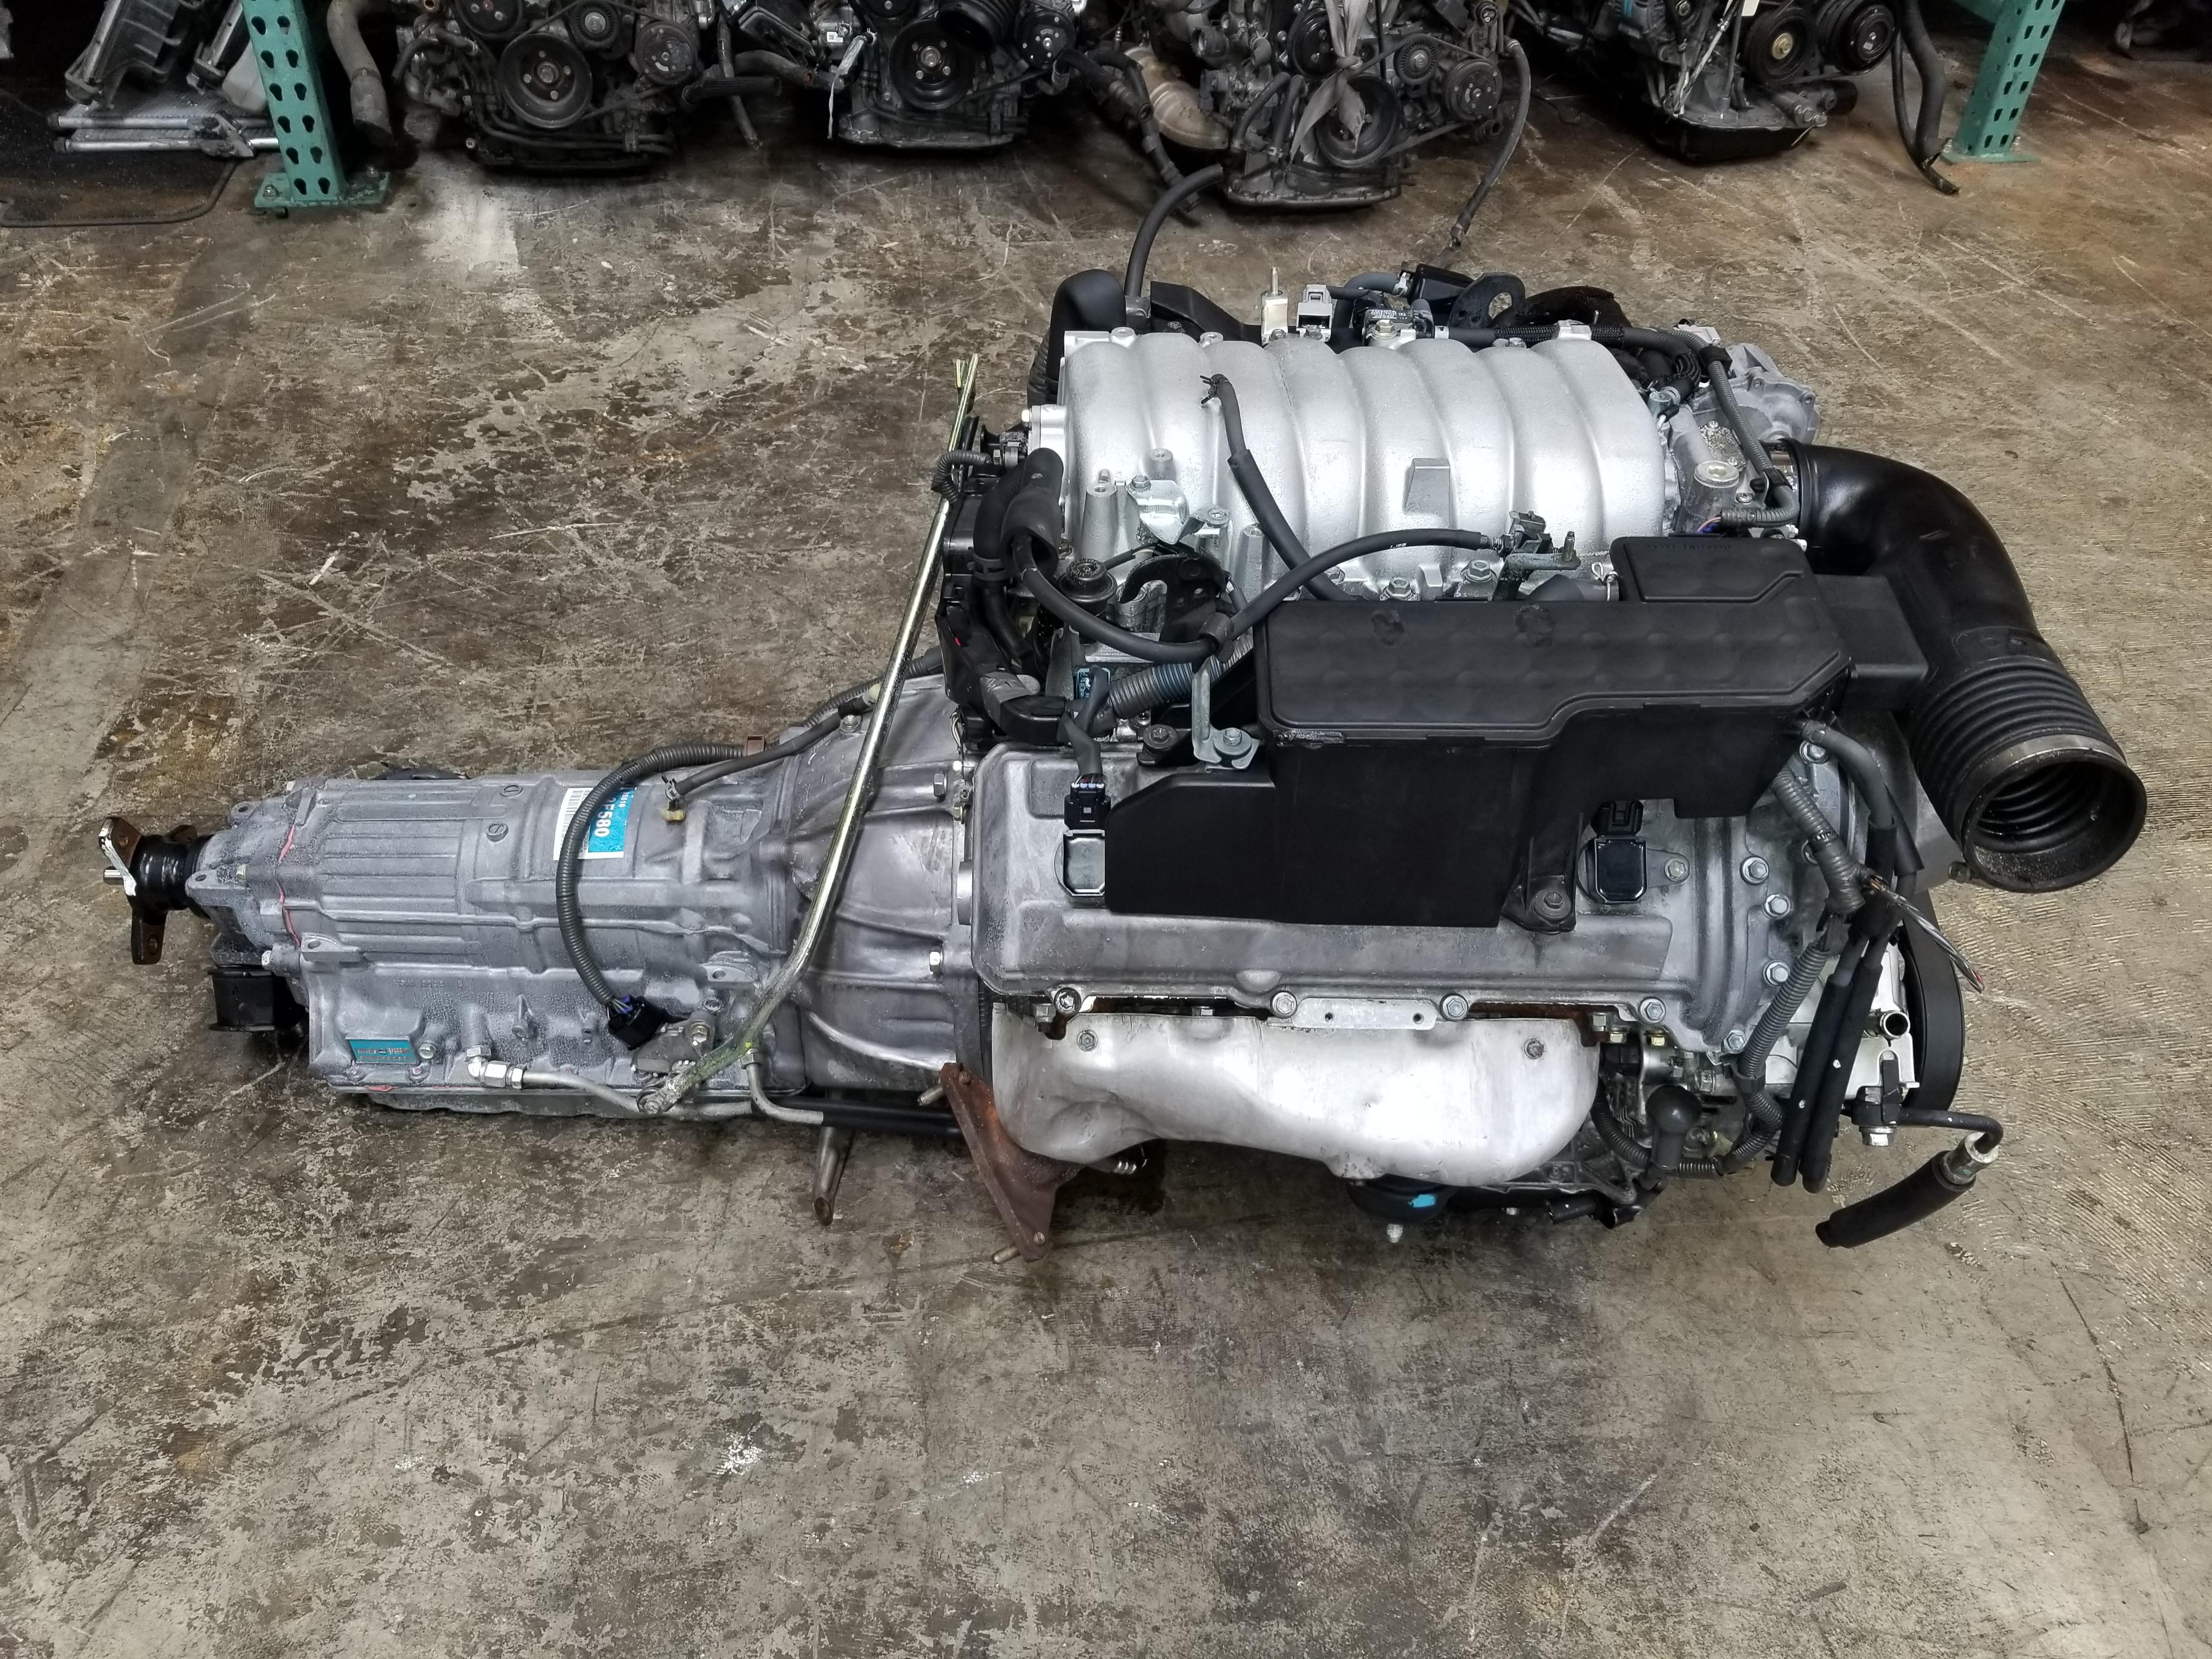 Nissan Chula Vista >> 1uz – 1998 2000 Lexus SC400 LS400 4.0L Engine JDM 1UZ-FE VVTi V8 Motor Toyota 1UZ | JDM Of San Diego